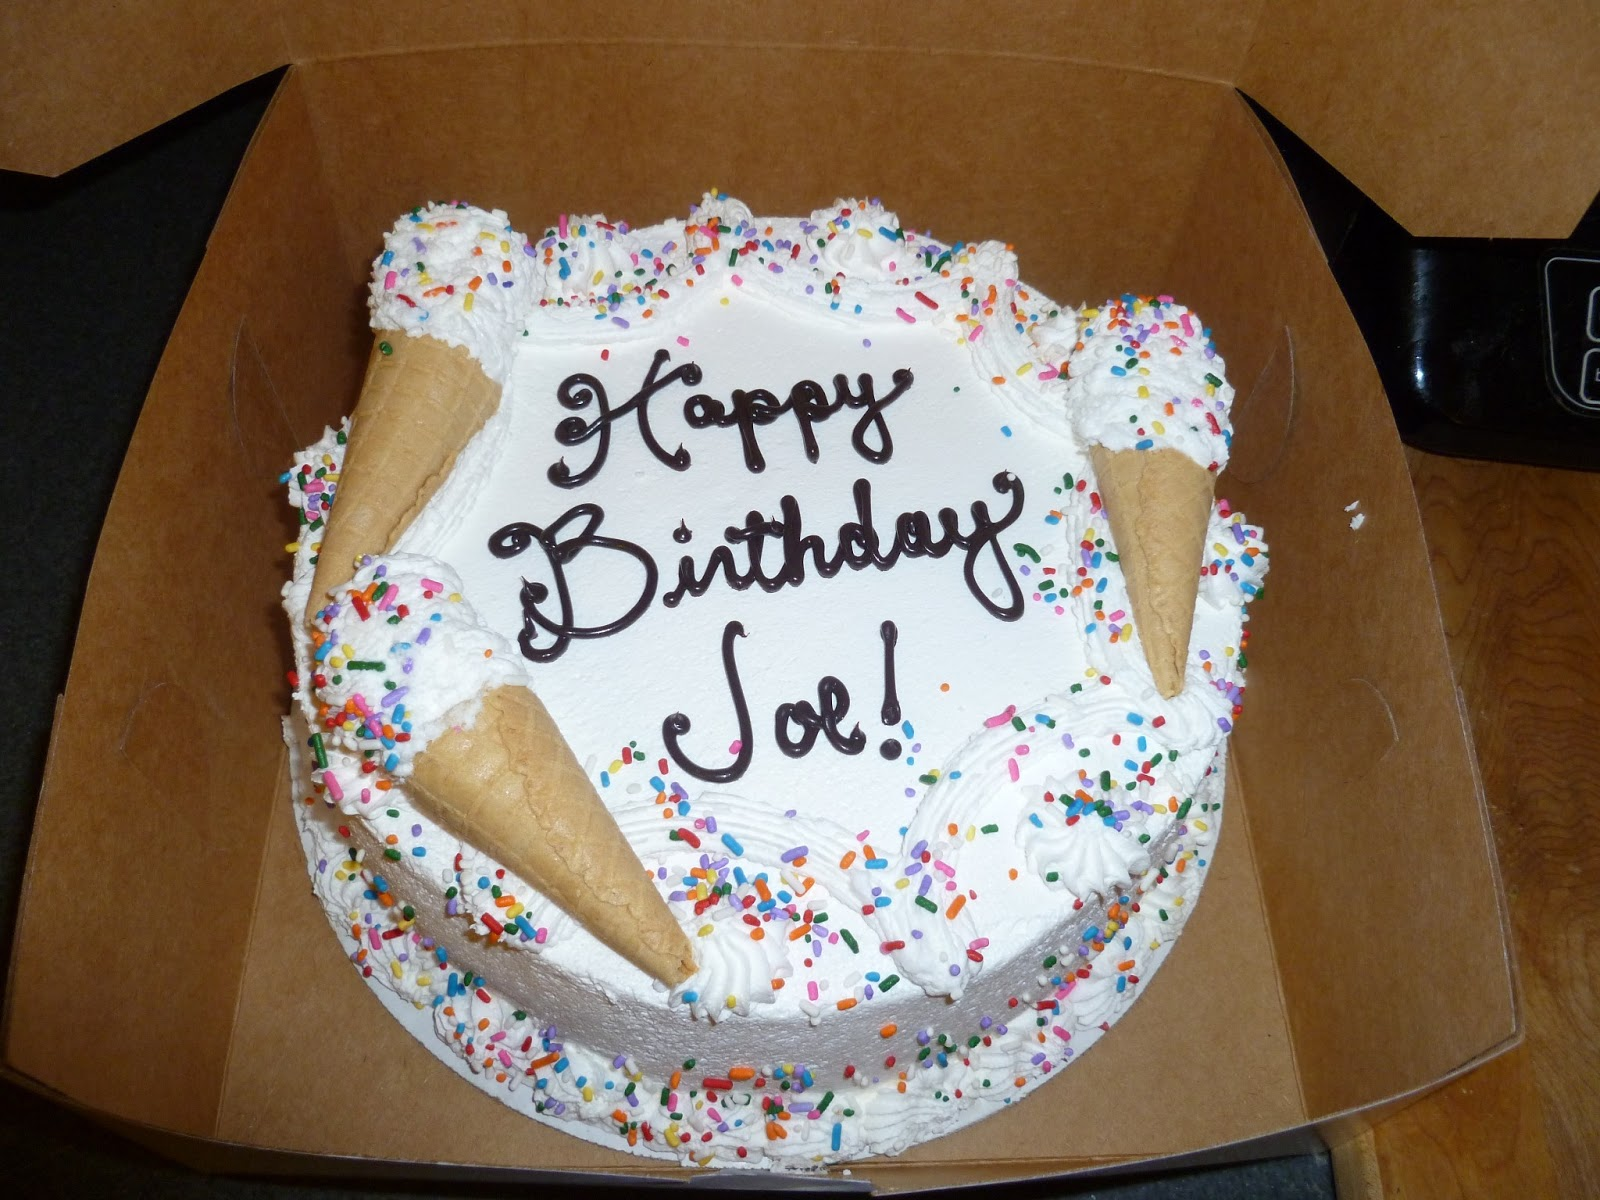 Happy birthday, Joe! JoeBirthdayCake